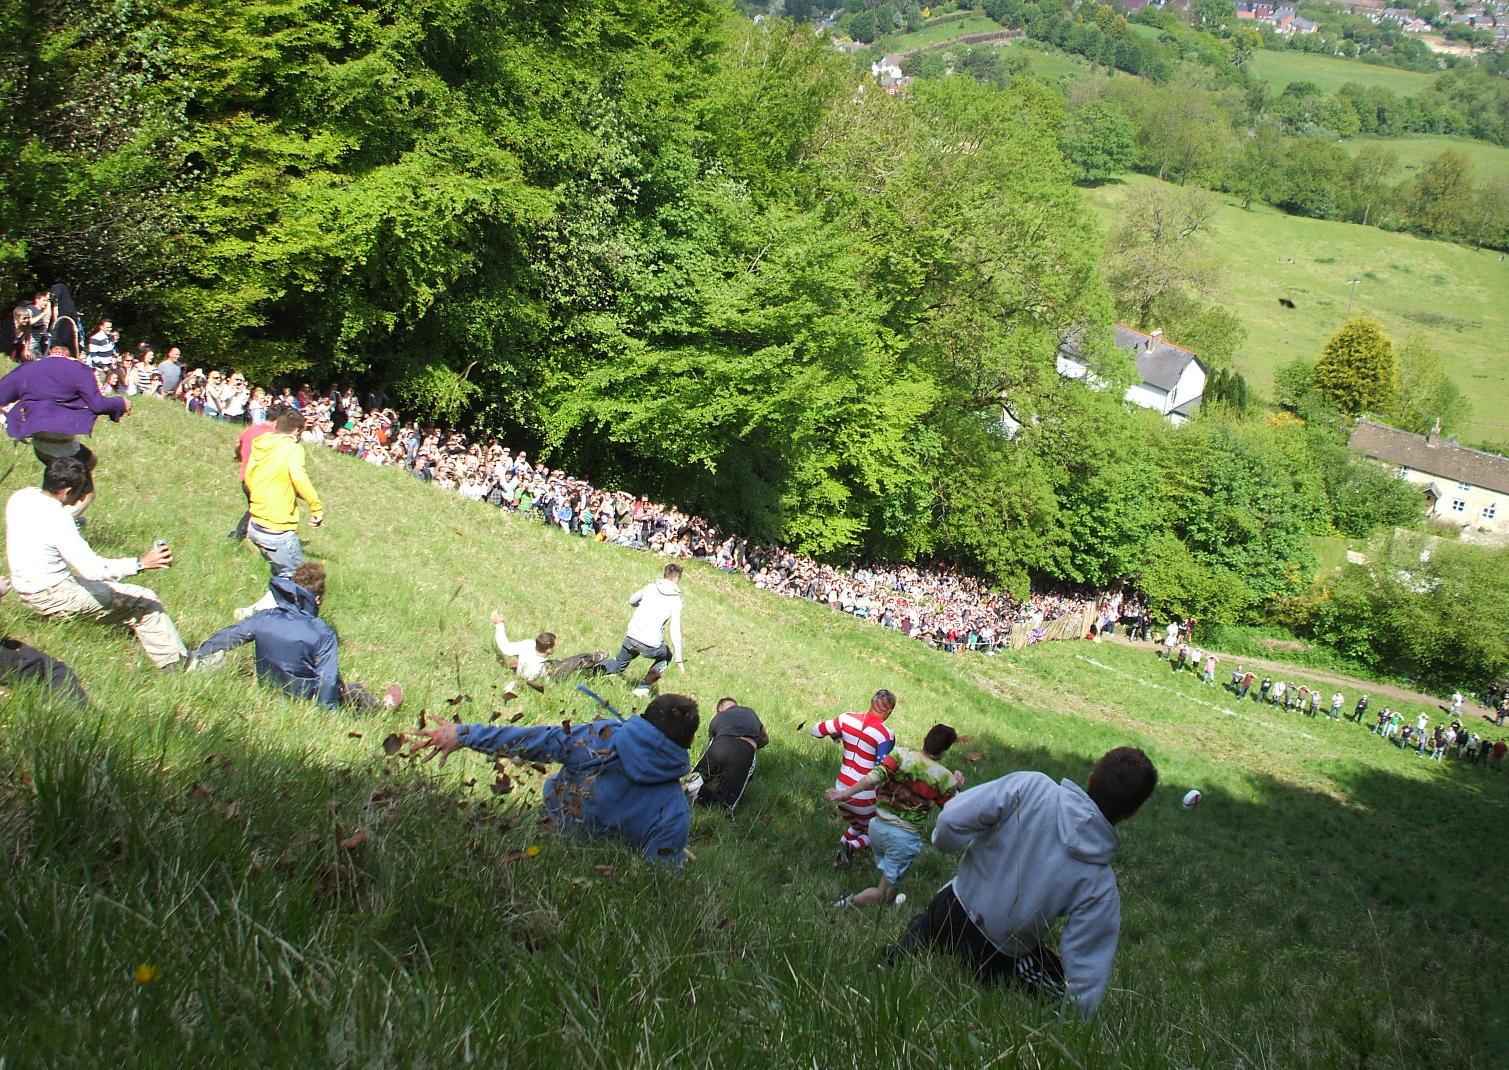 A corrida do queijo atrai vários visitantes e apesar de perigoso, é extremamente divertido. [Foto: Dave Farrance - Wikimedia]